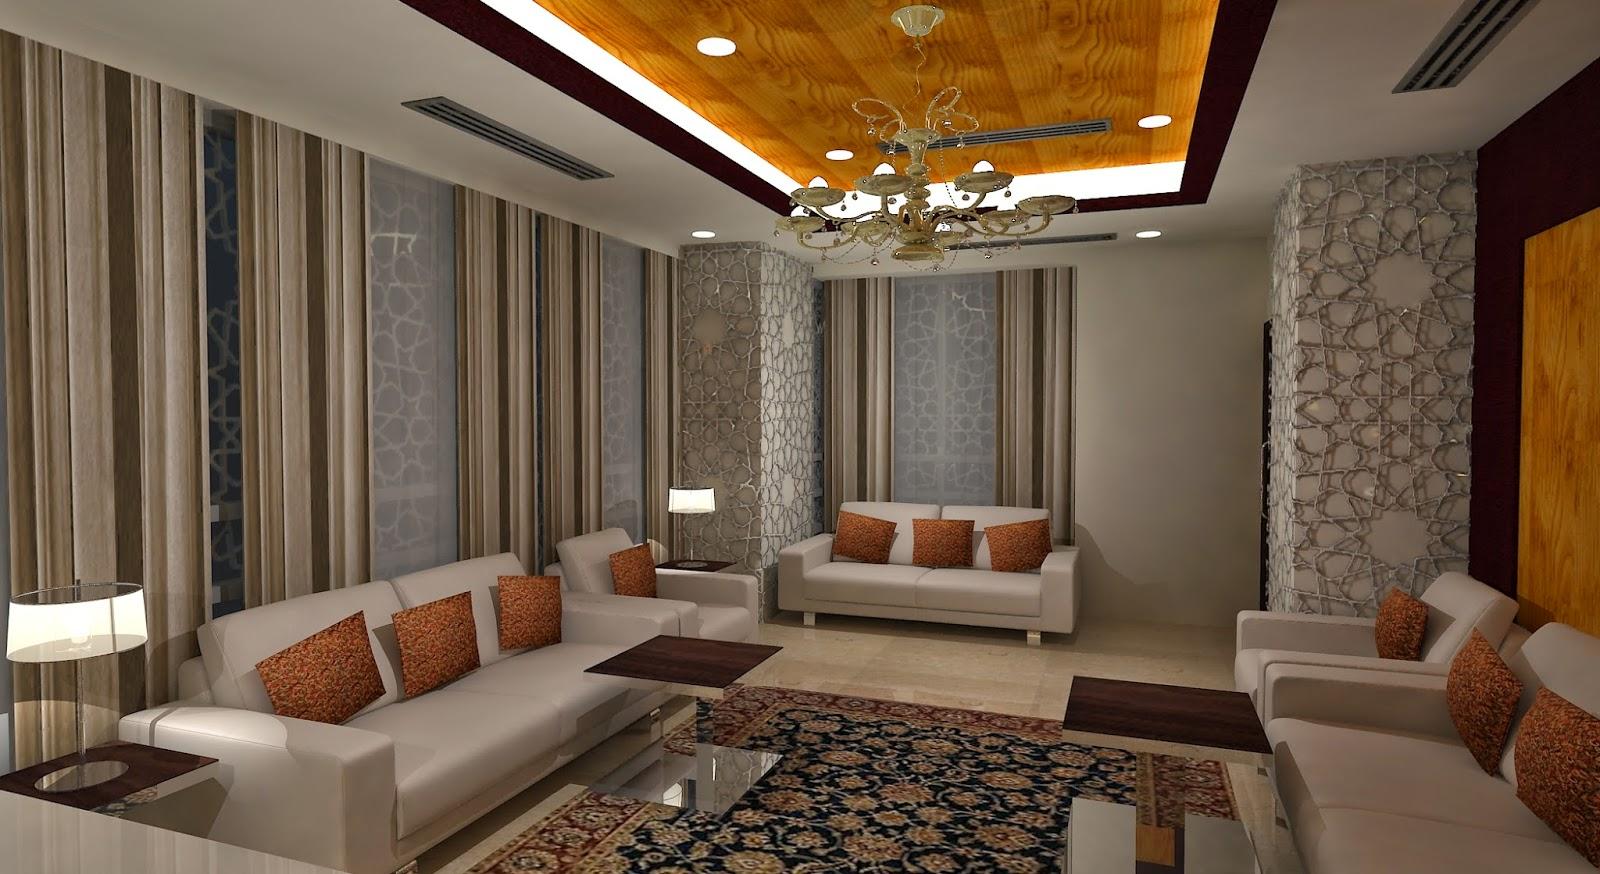 Gurooji design new office design in dubai for Latest office design